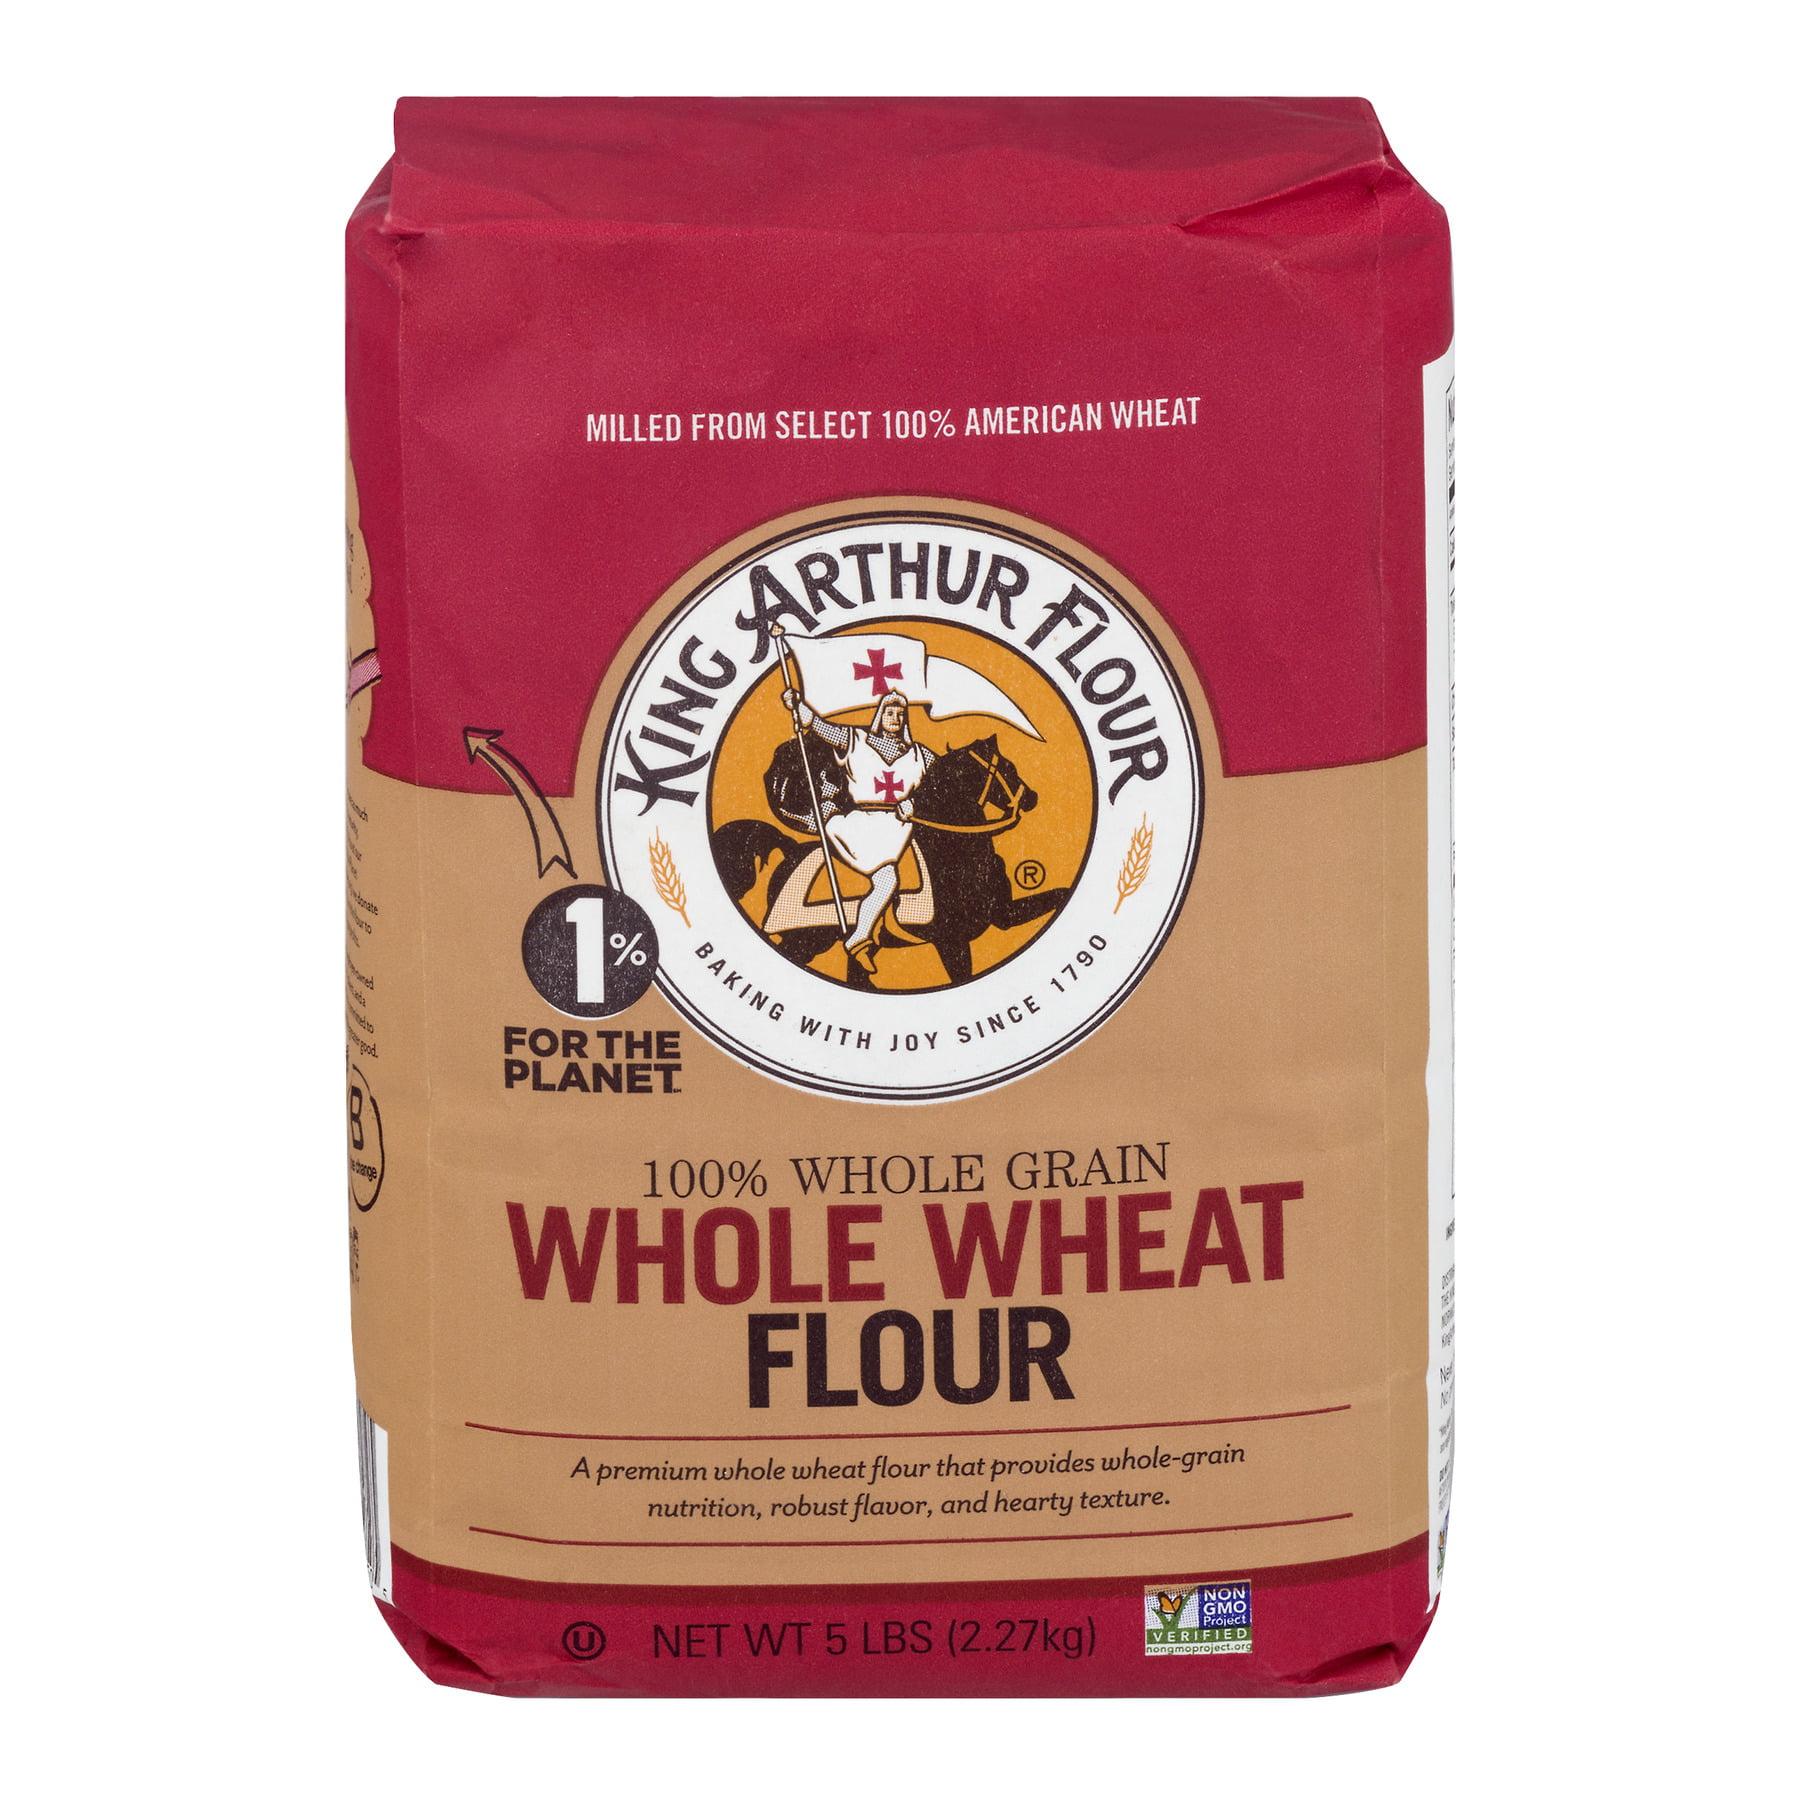 King Arthur Flour Premium 100% Whole Wheat Flour, 5.0 LB